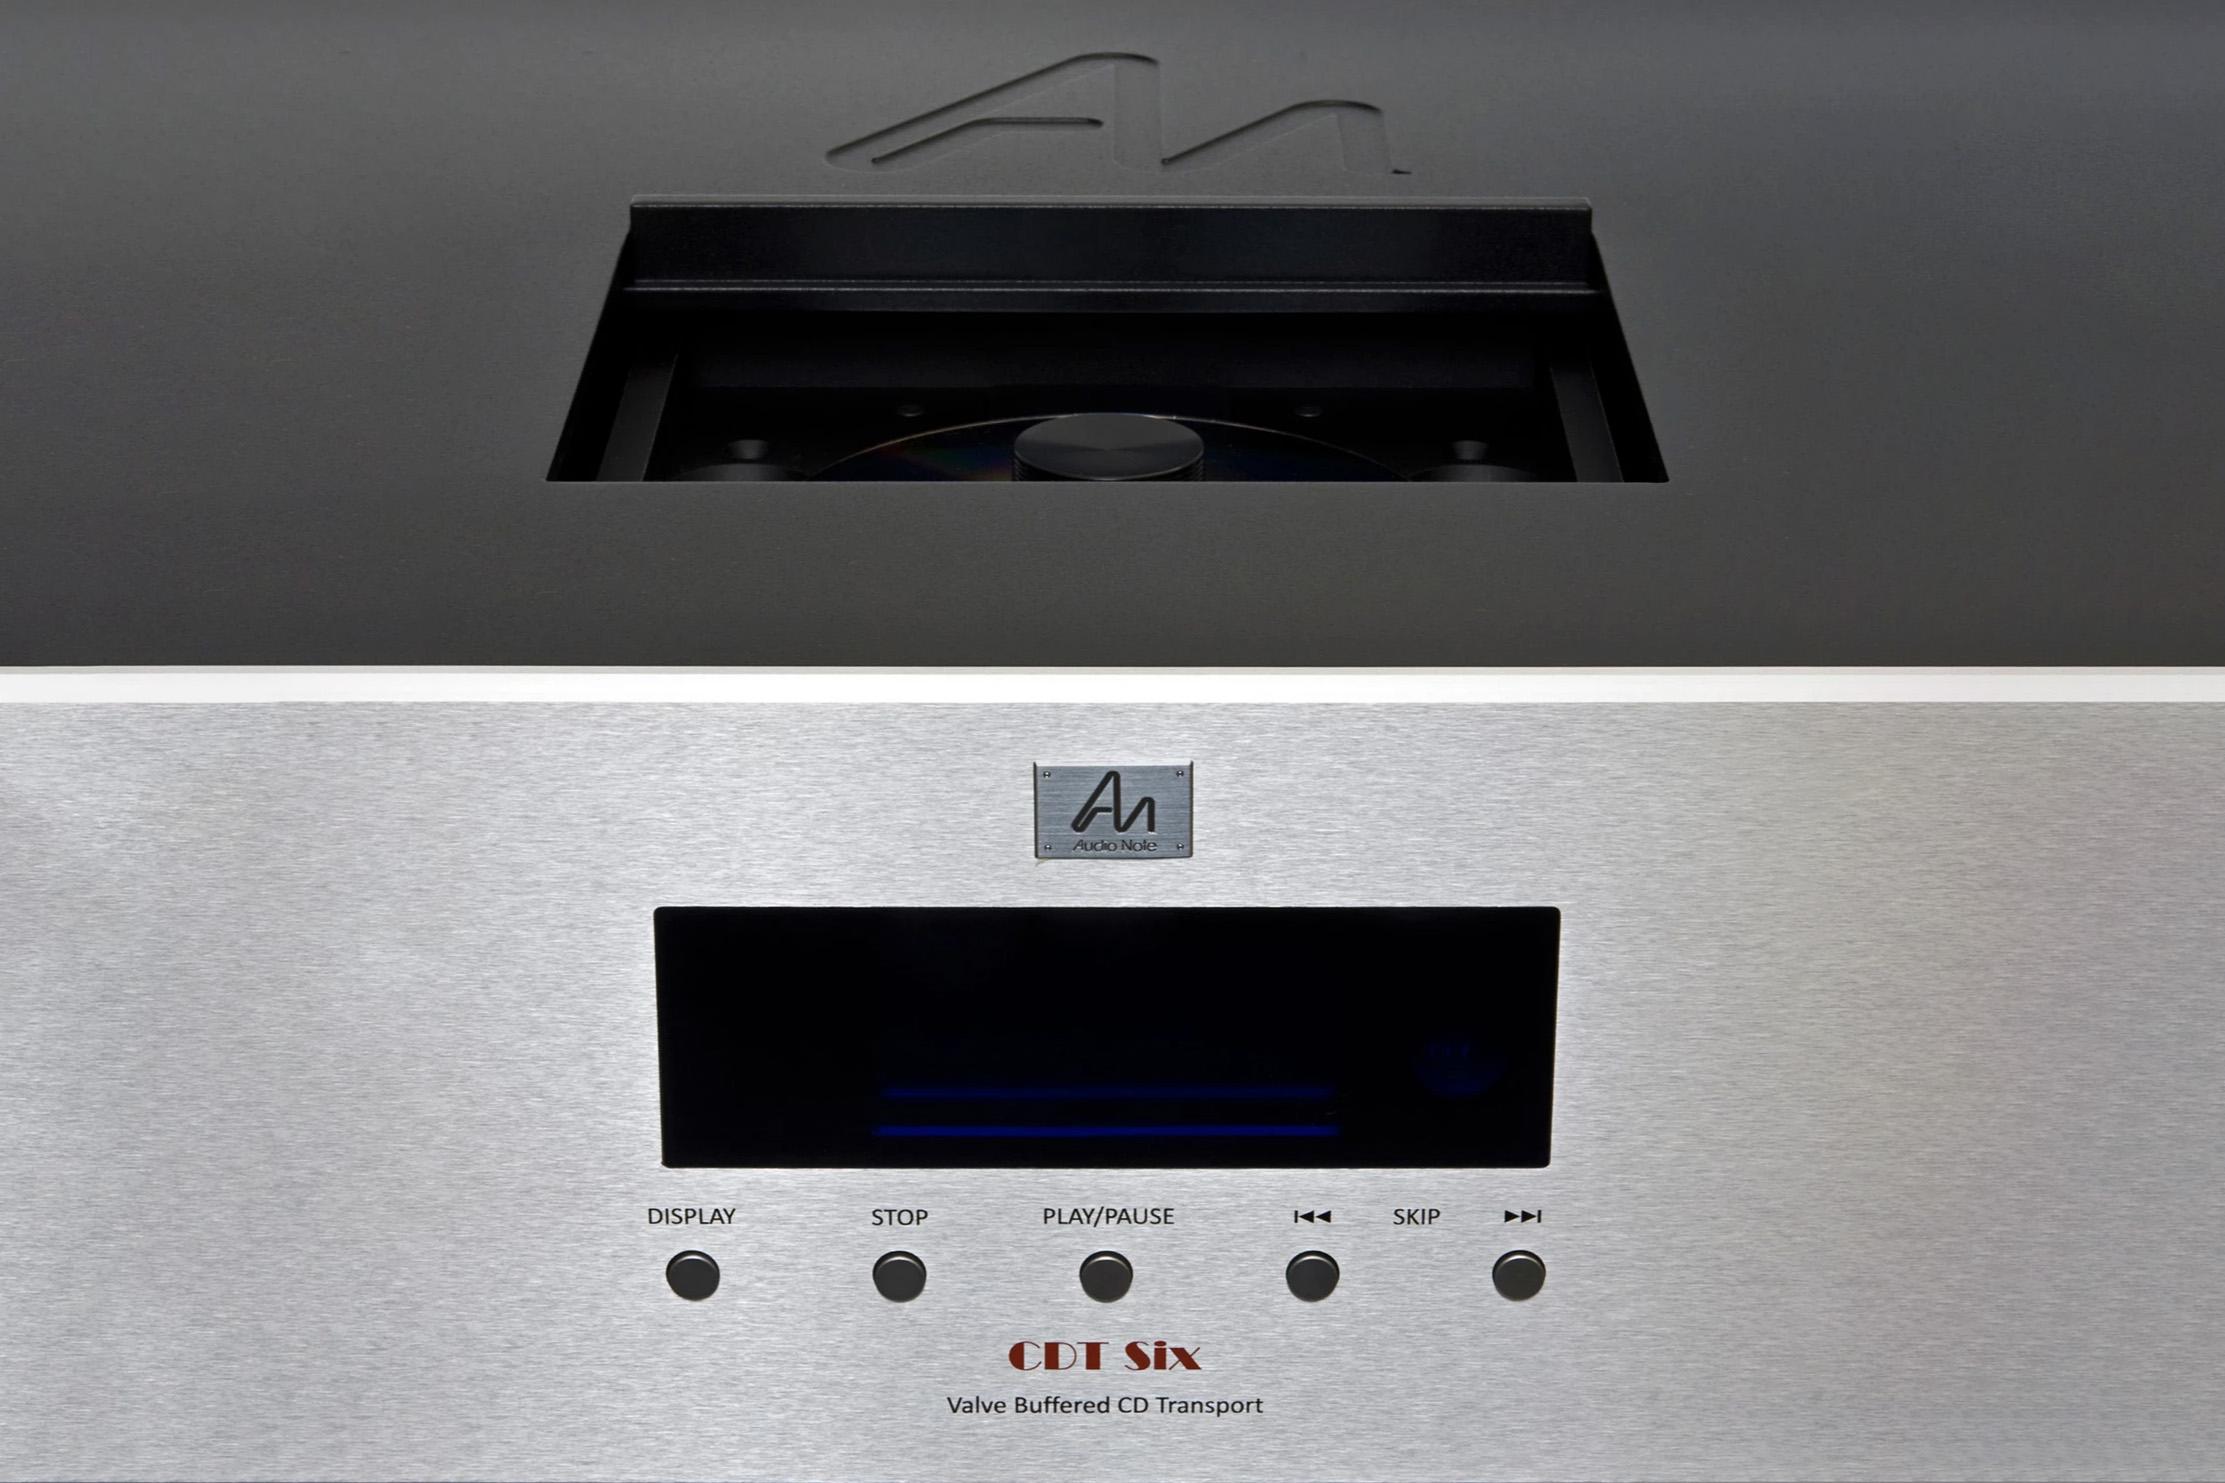 audio-note-cdt-six-cd-transport-silver.jpg